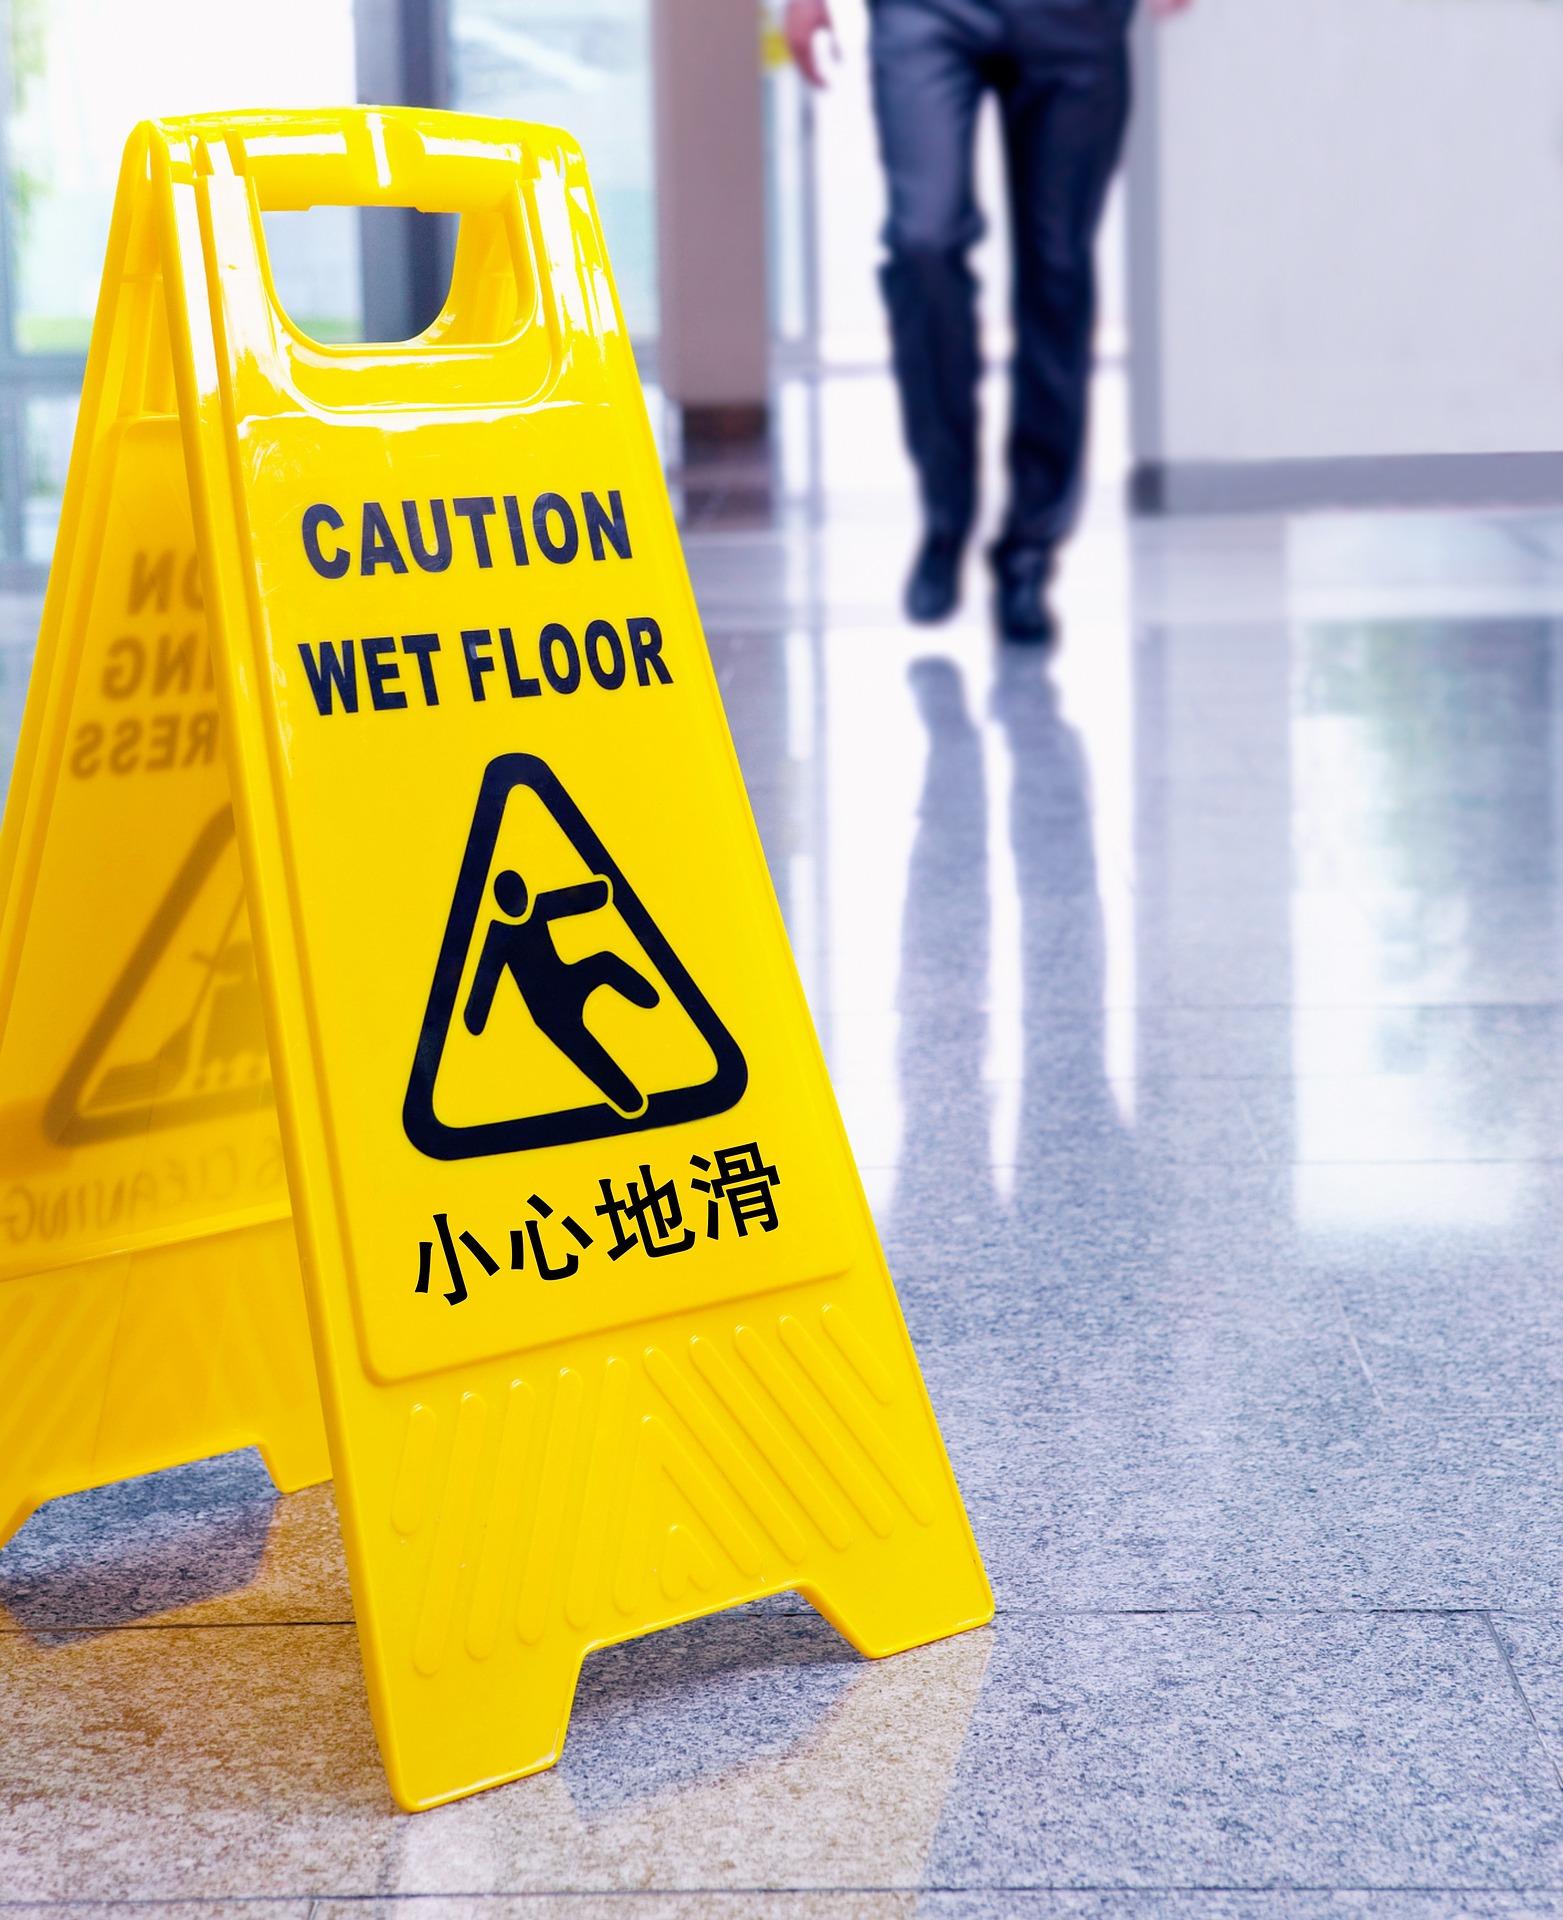 944004_1920_M_Wet floors_Slip_Fall_causion sign.jpg